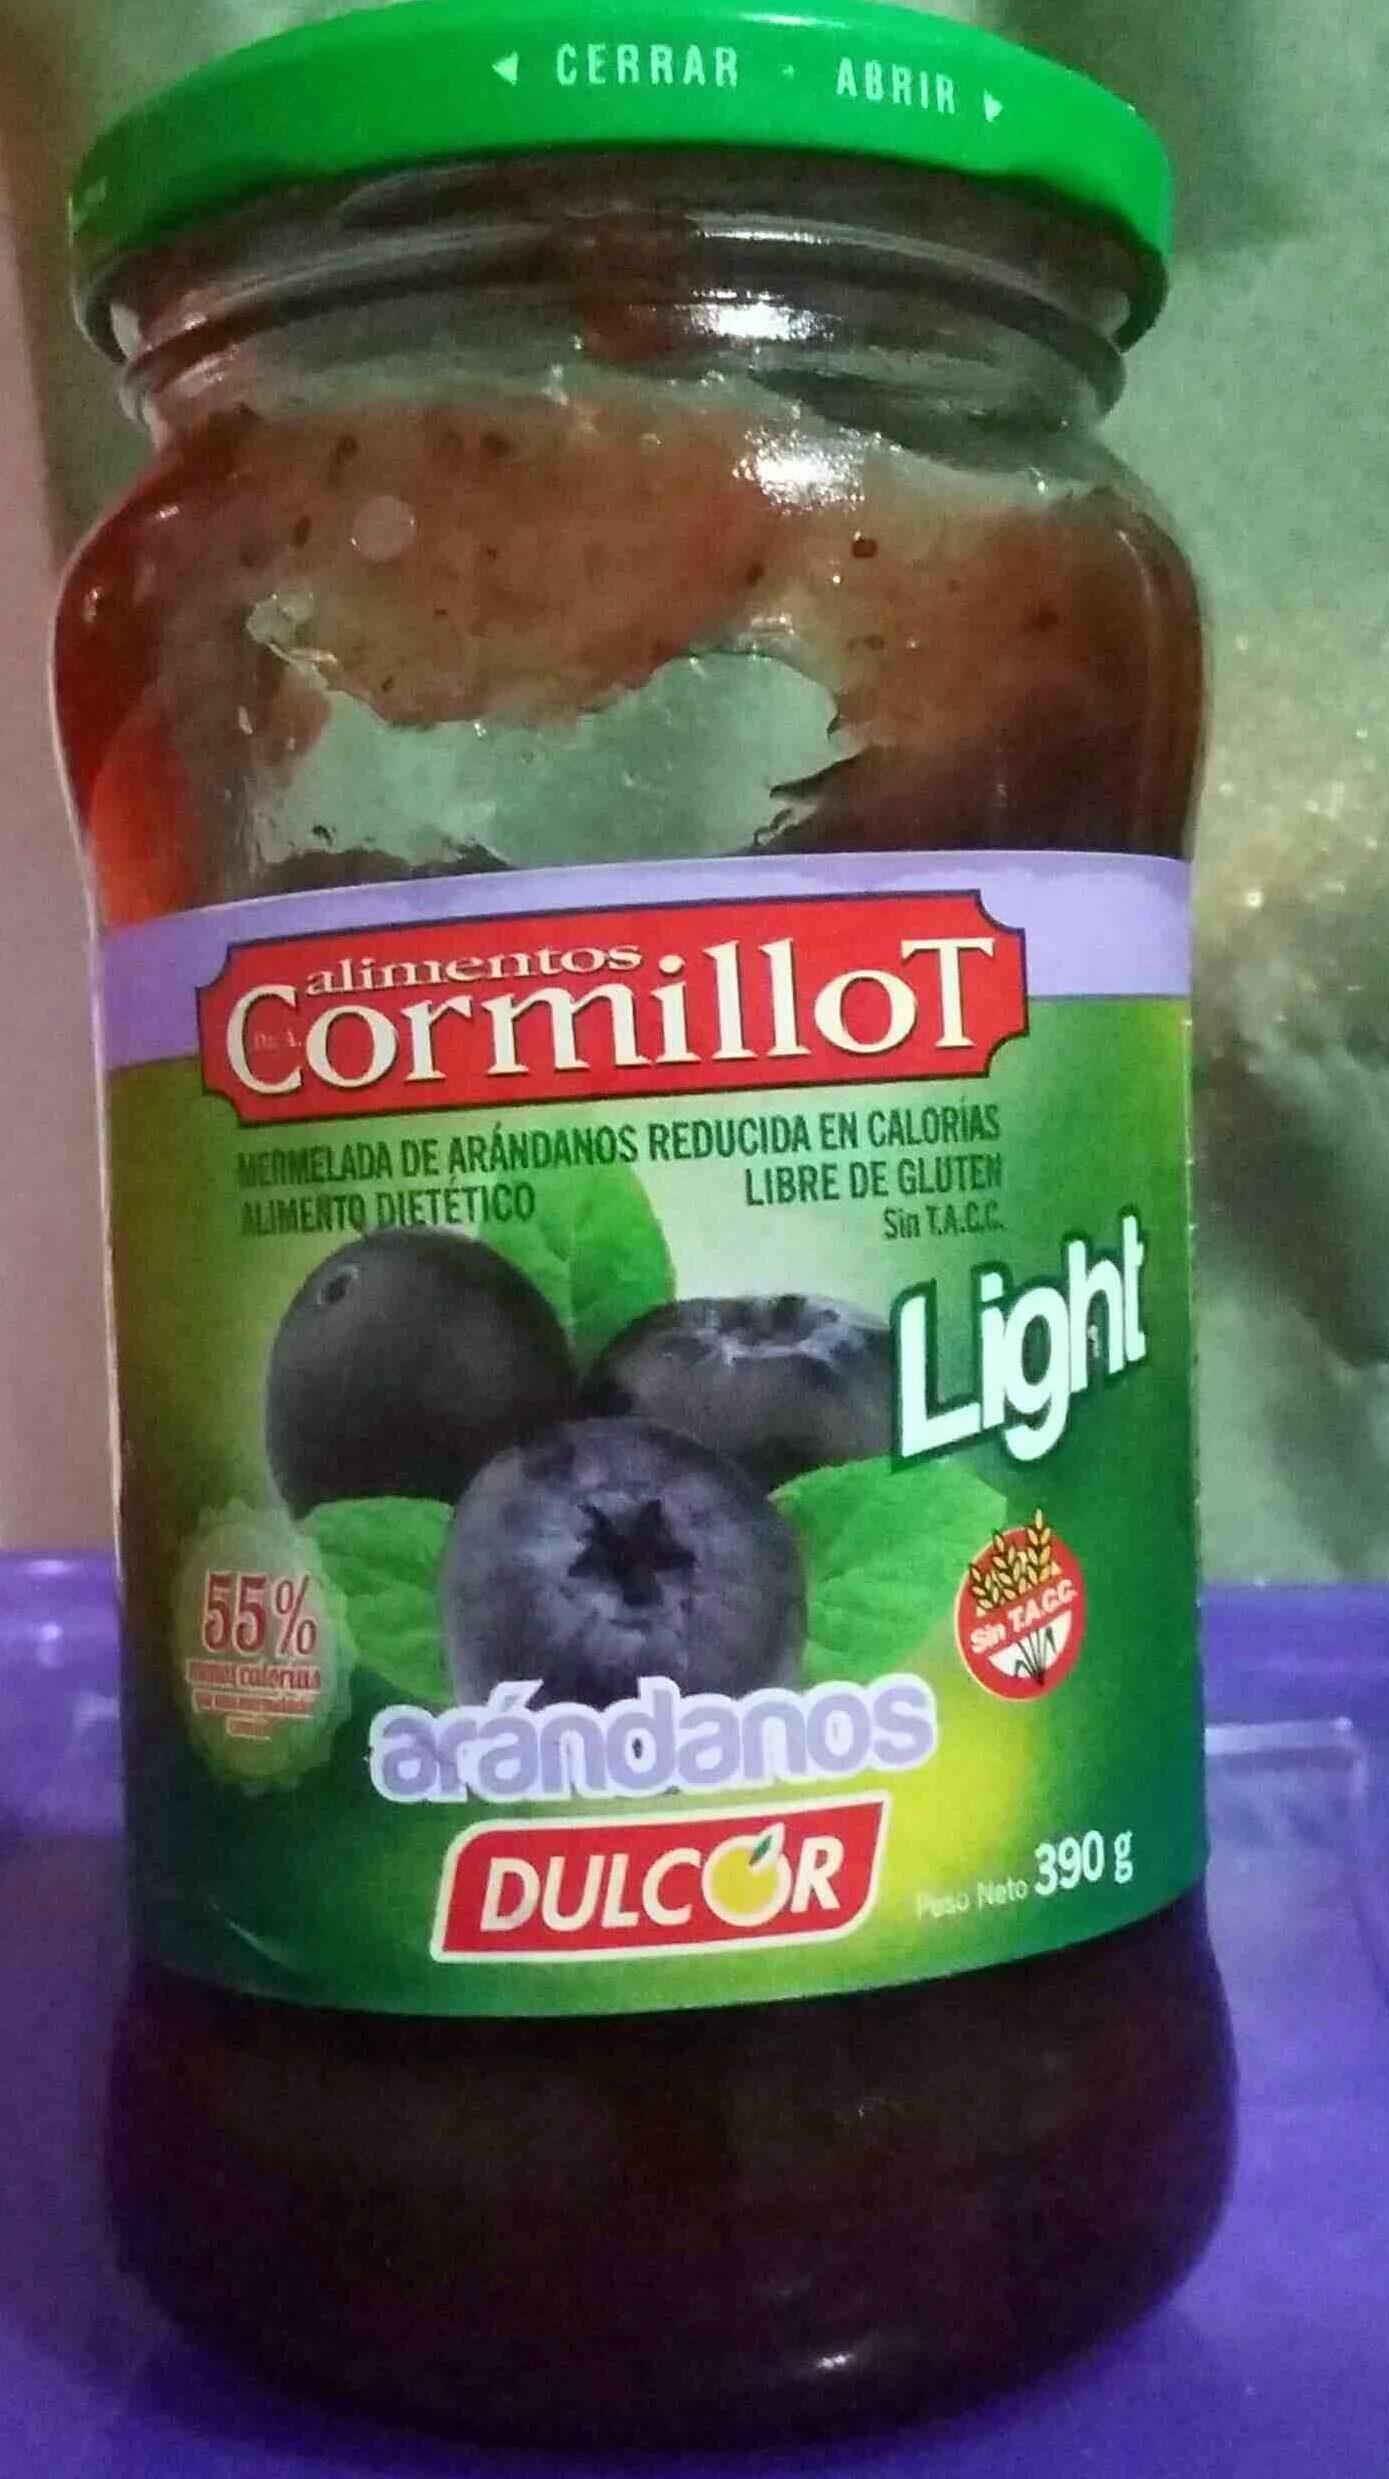 Mermelada light de arándanos - Product - es